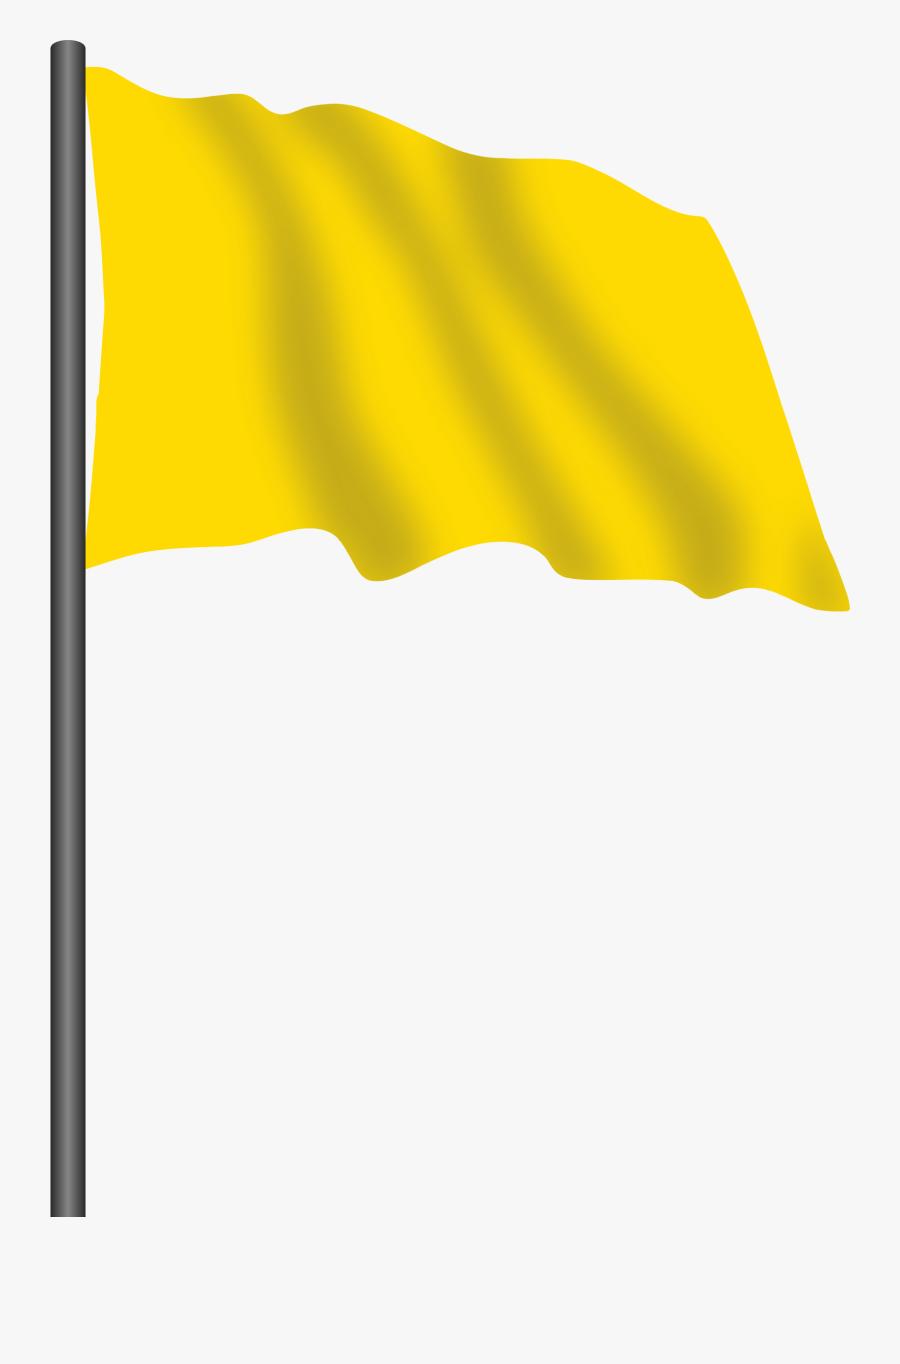 Motor Racing Flag - Yellow Colour Flag Png, Transparent Clipart